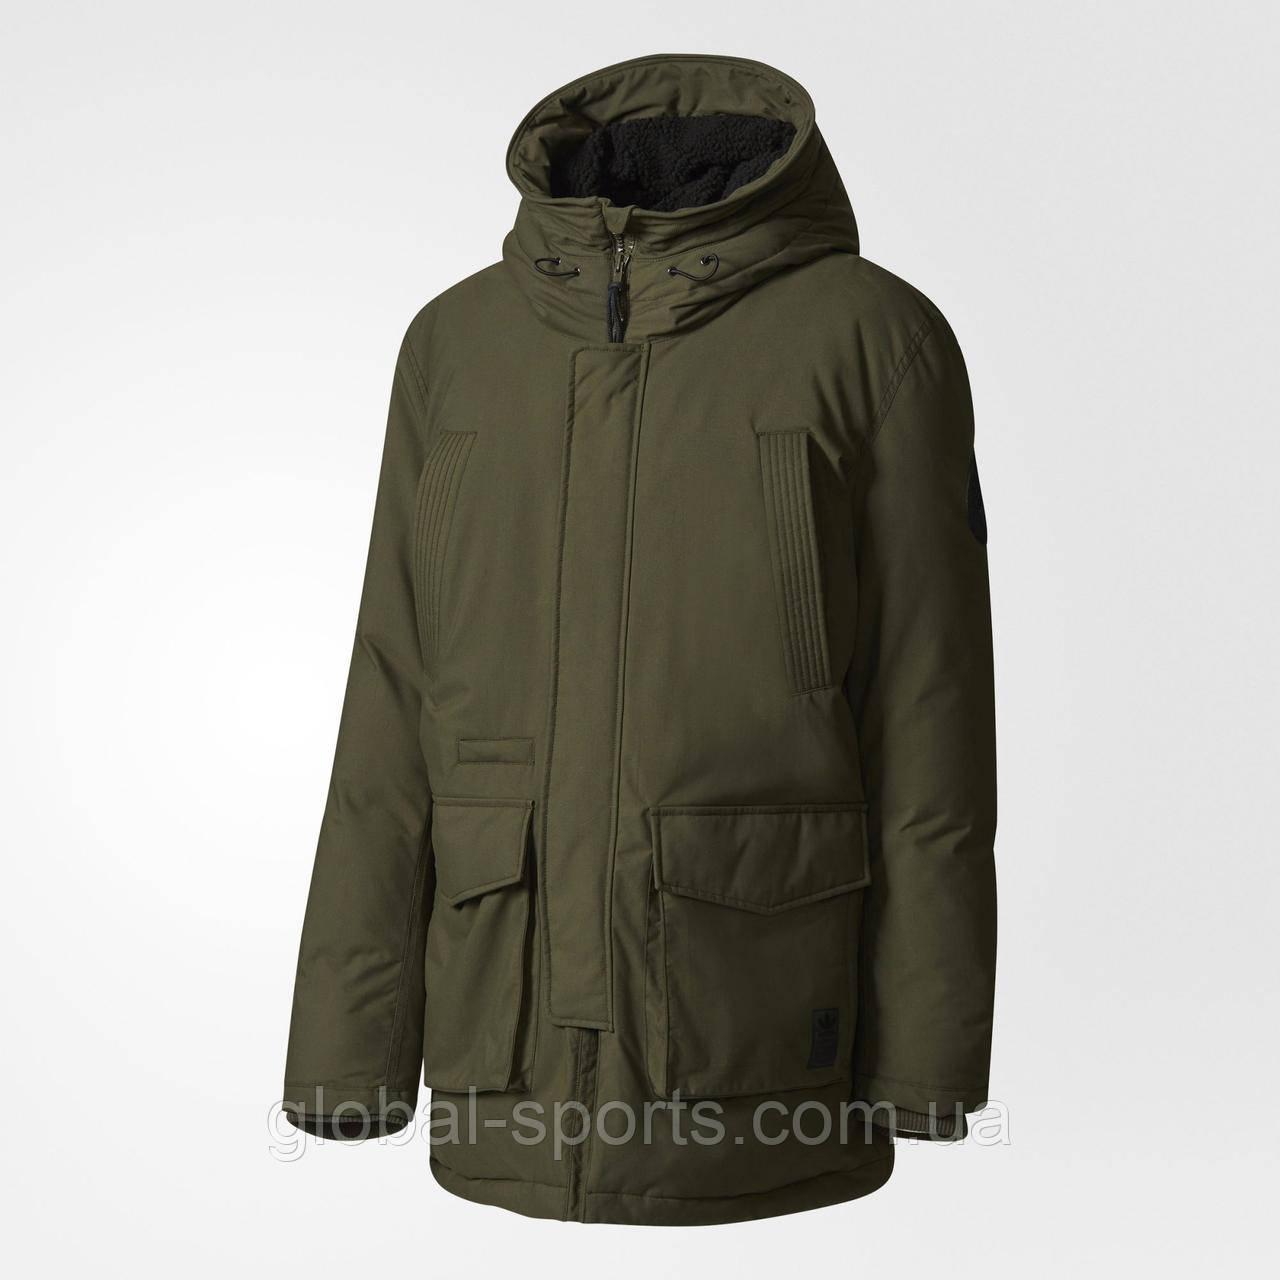 8626e0aa Мужская парка Adidas Originals Heavy(Артикул:BQ5265): продажа, цена ...